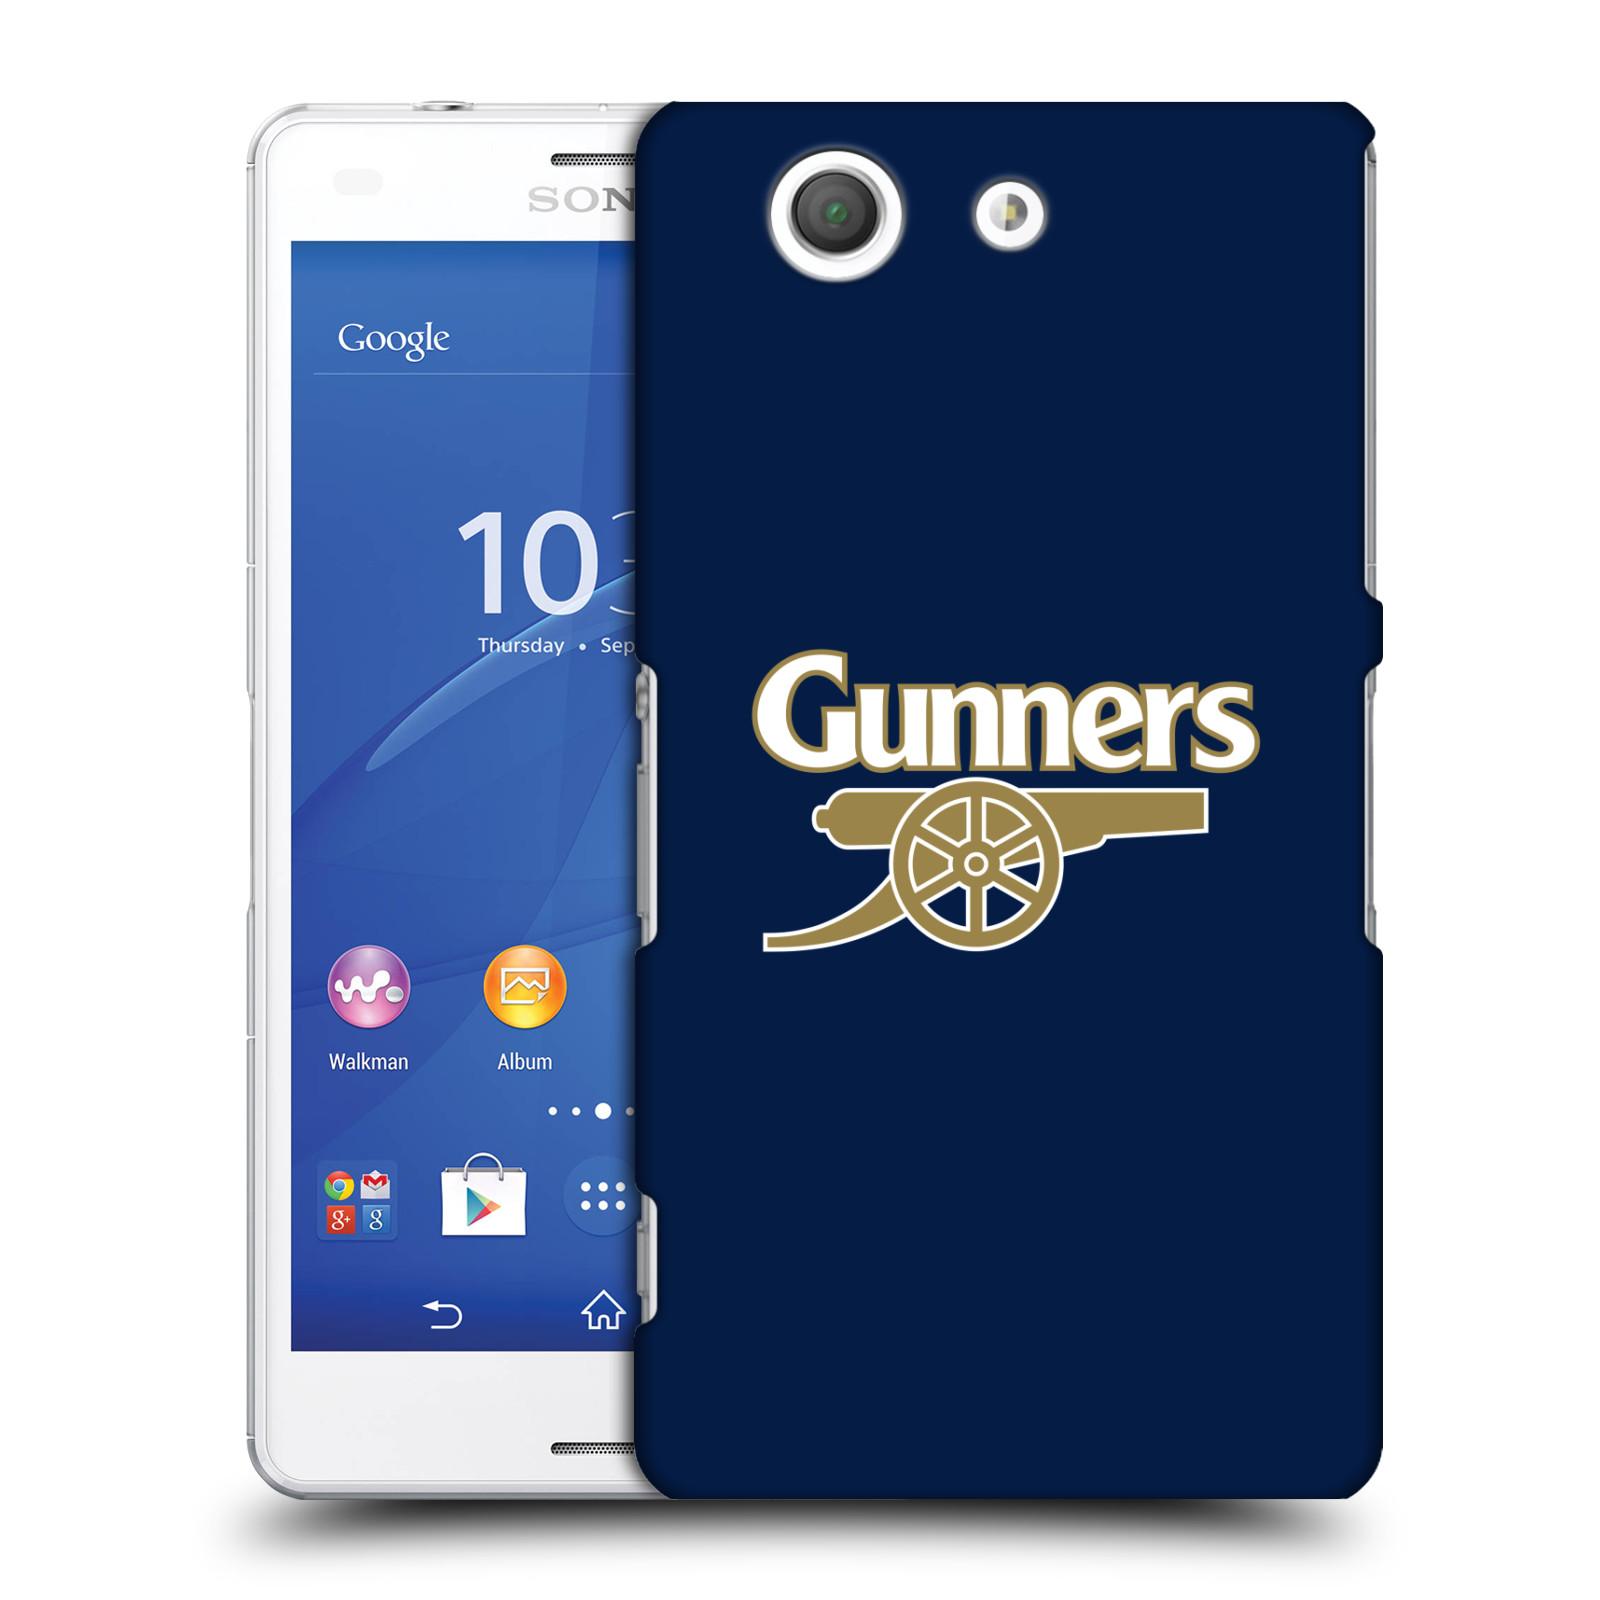 Plastové pouzdro na mobil Sony Xperia Z3 Compact D5803 - Head Case - Arsenal FC - Gunners